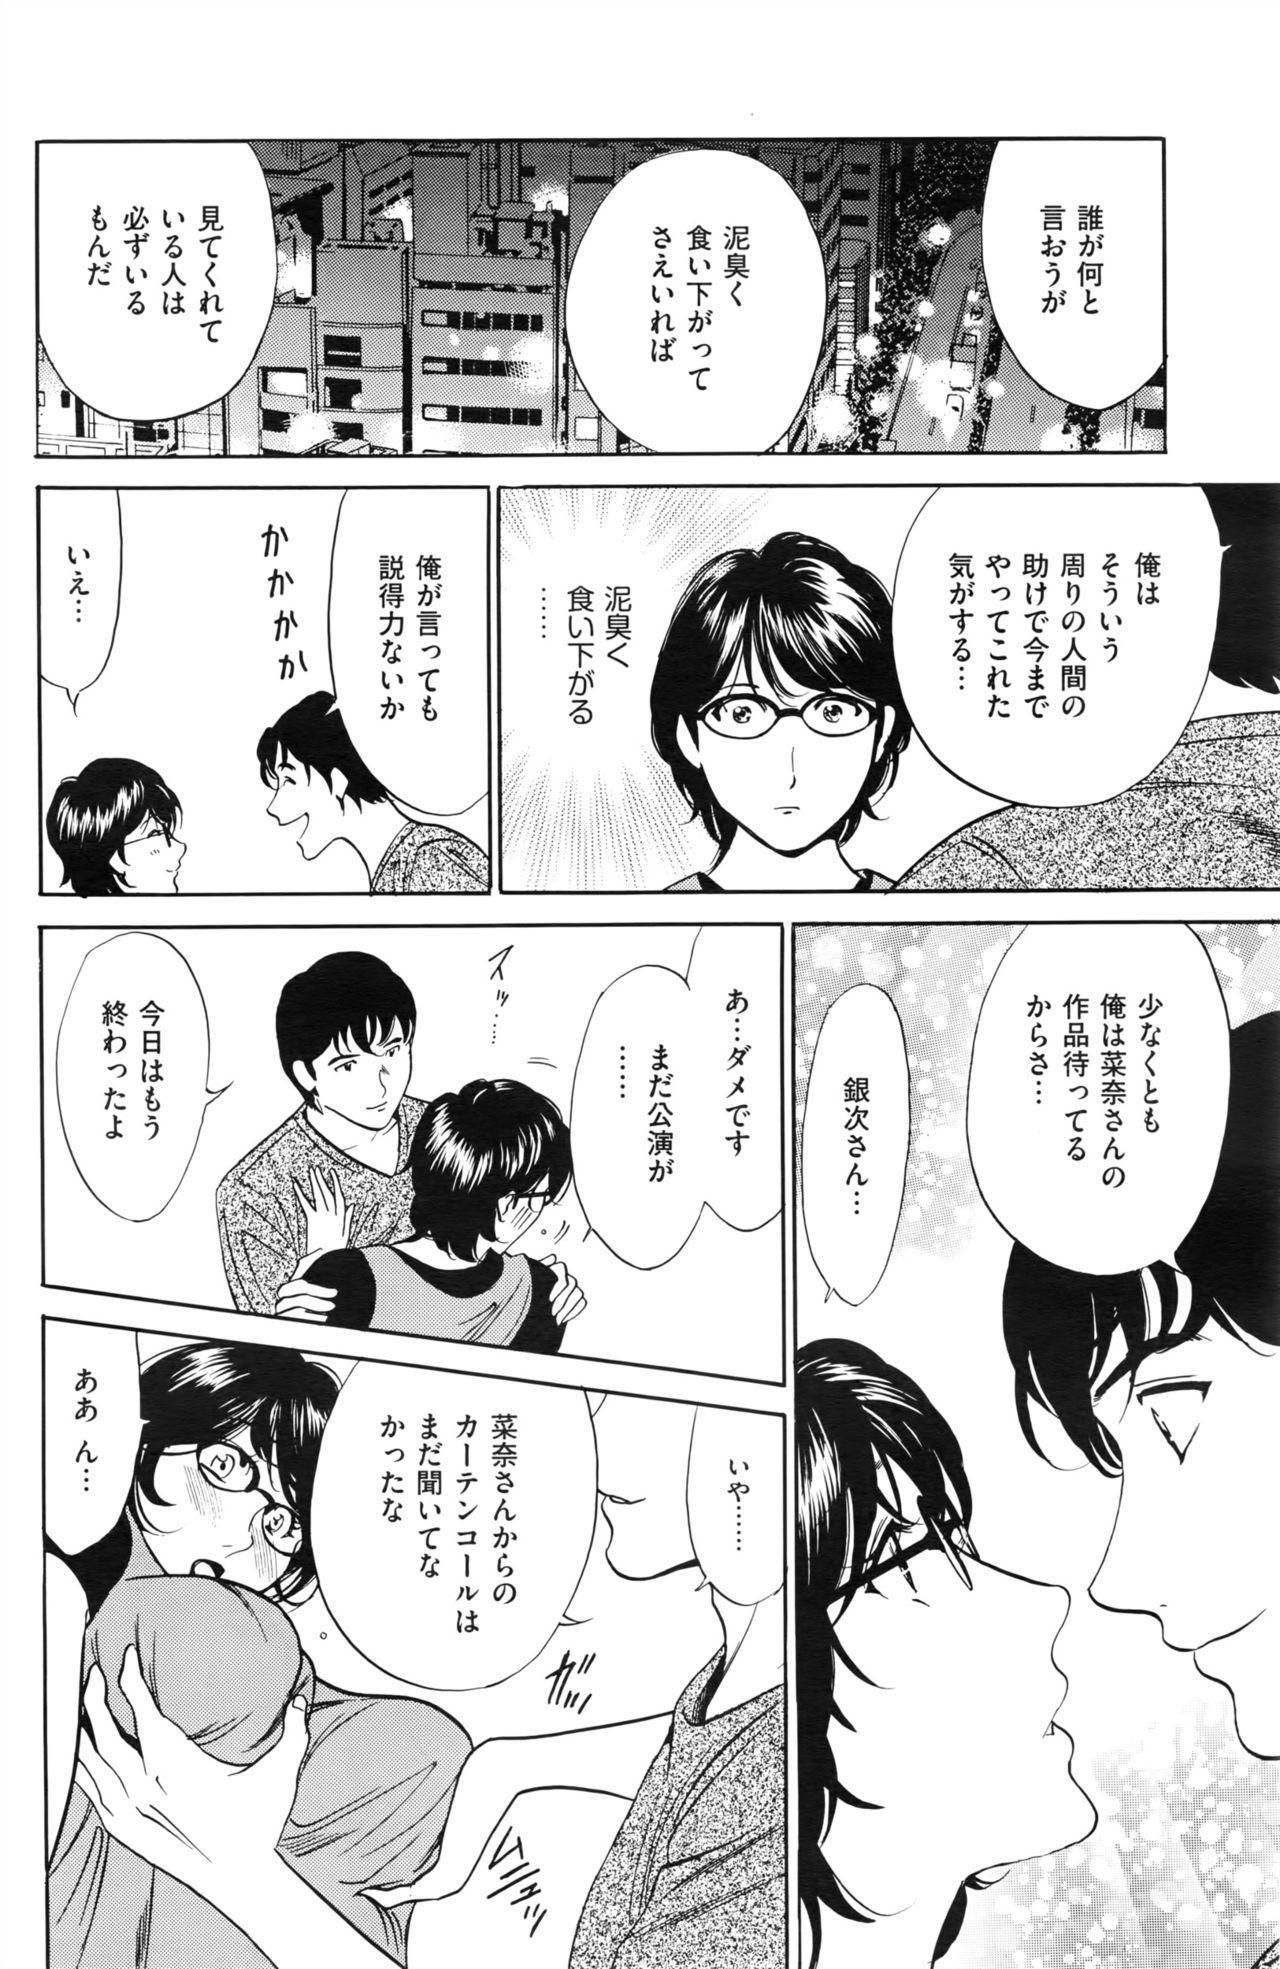 Wa Usuki Ipa a 1-10 68